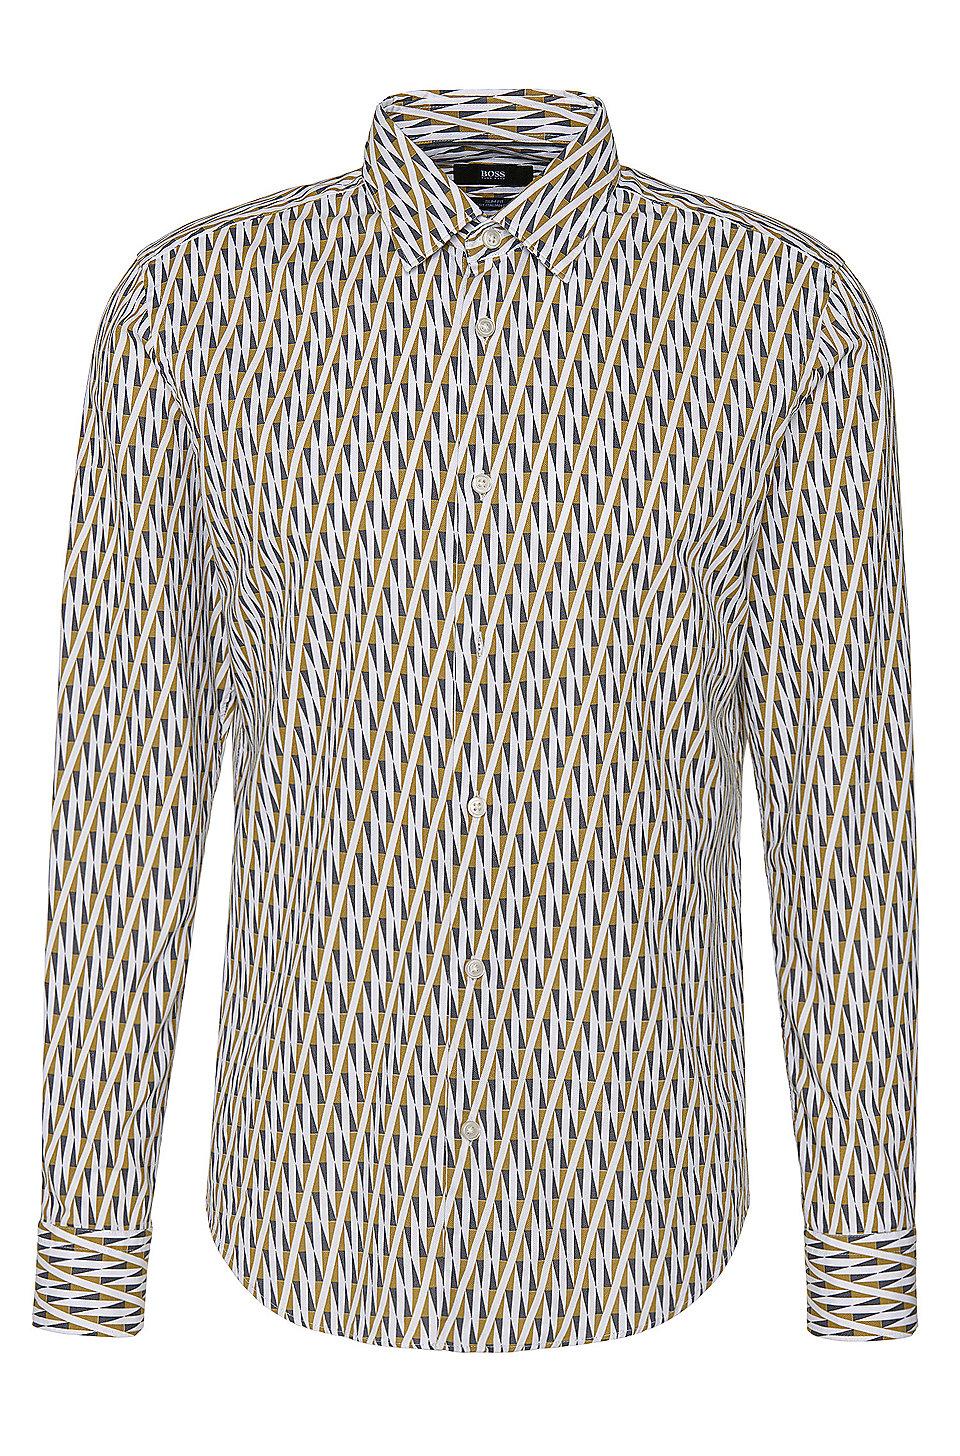 571356fa2 BOSS - 'Ronni F' | Slim Fit, Italian Cotton Patterned Button Down Shirt